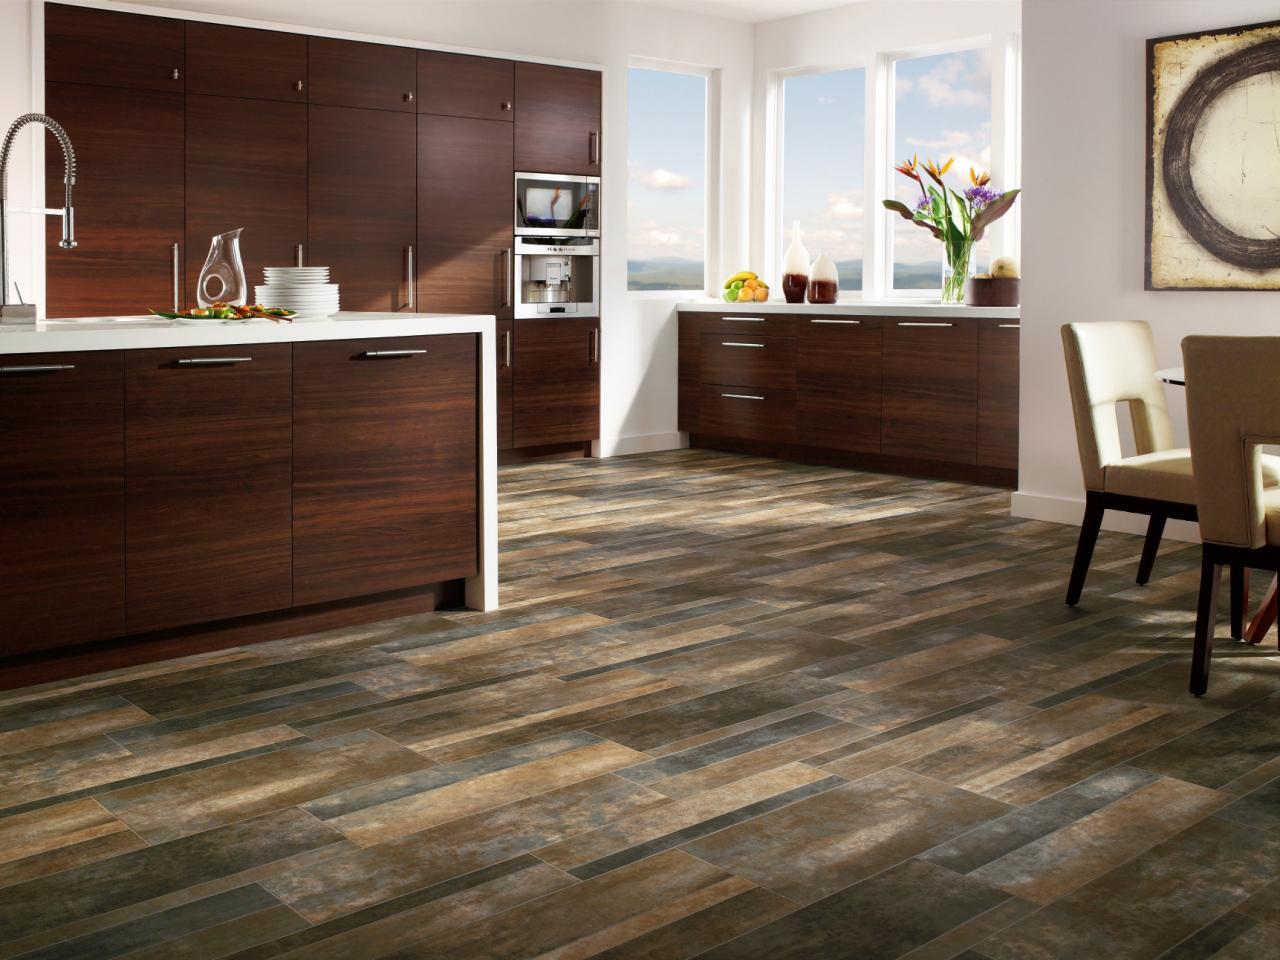 Alternative Kitchen Flooring Alternatives To Laminate Flooring All About Flooring Designs